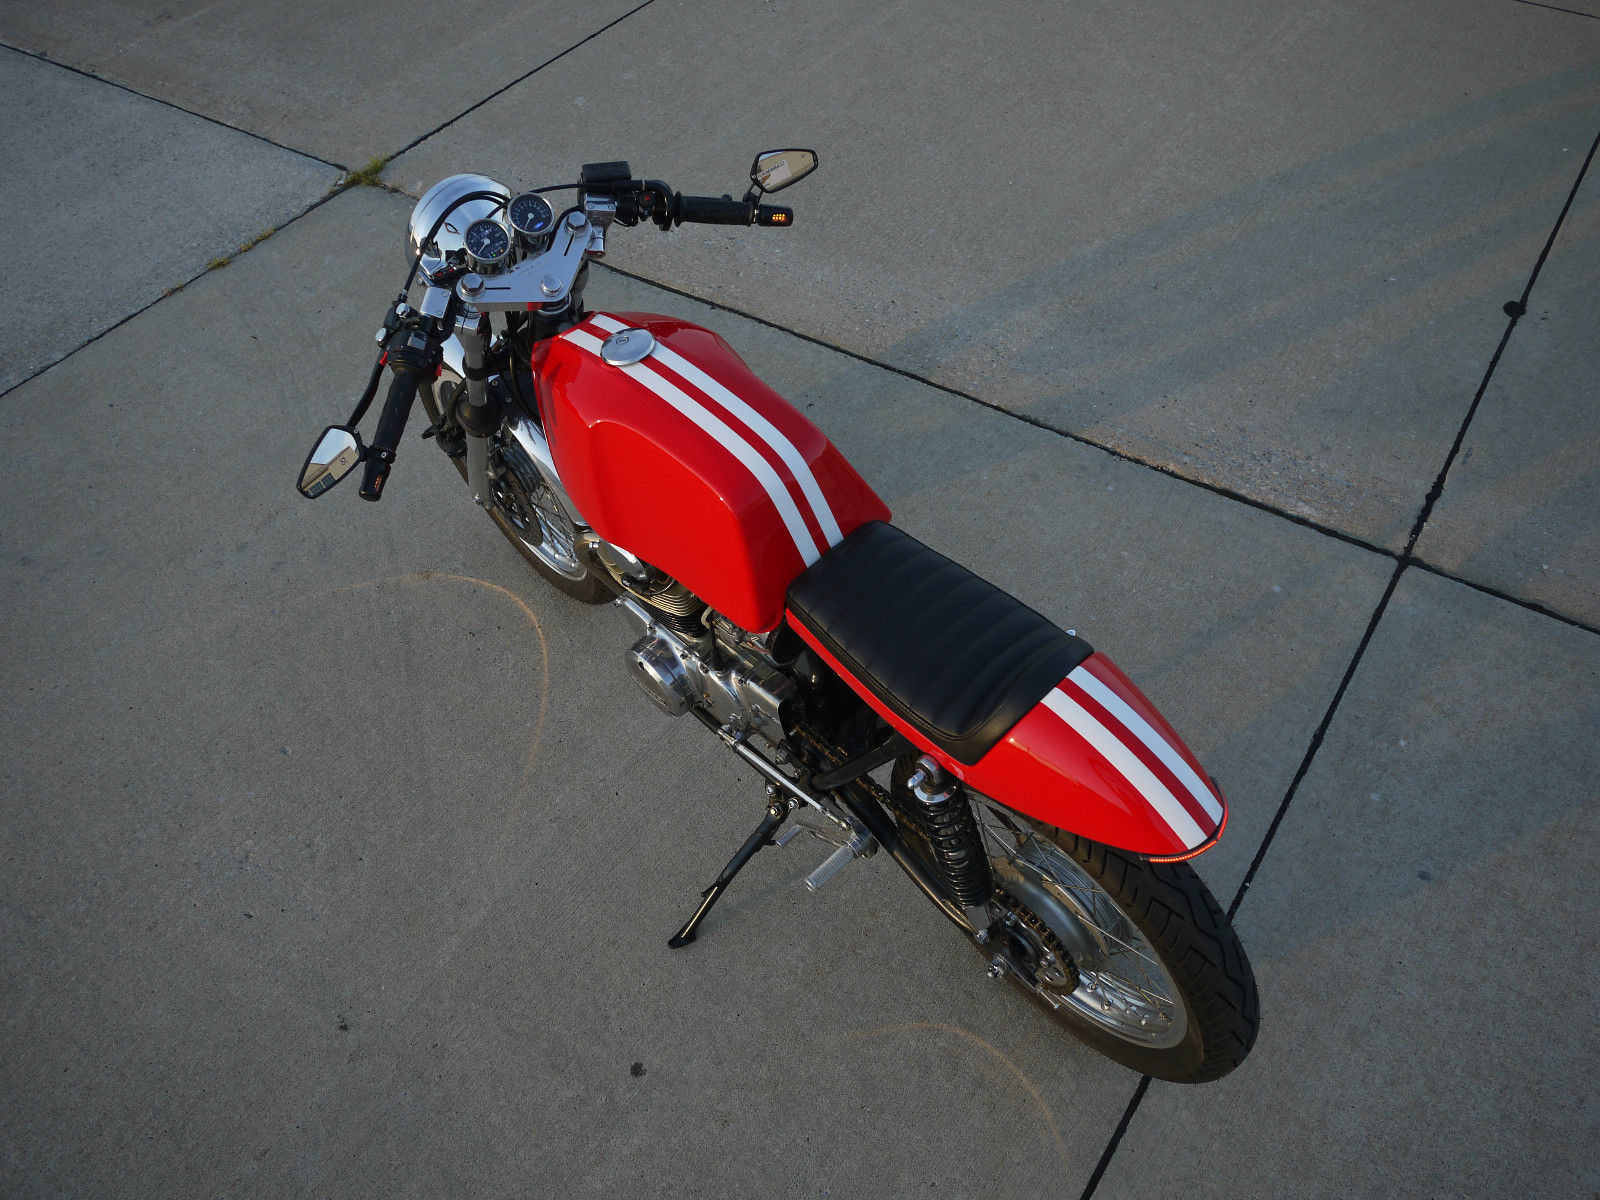 Honda_CB350_Cafe_Racer_13. Honda_CB350_Cafe_Racer_12. Honda_CB350_Cafe_Racer_11. Honda_CB350_Cafe_Racer_10. Honda_CB350_Cafe_Racer_9